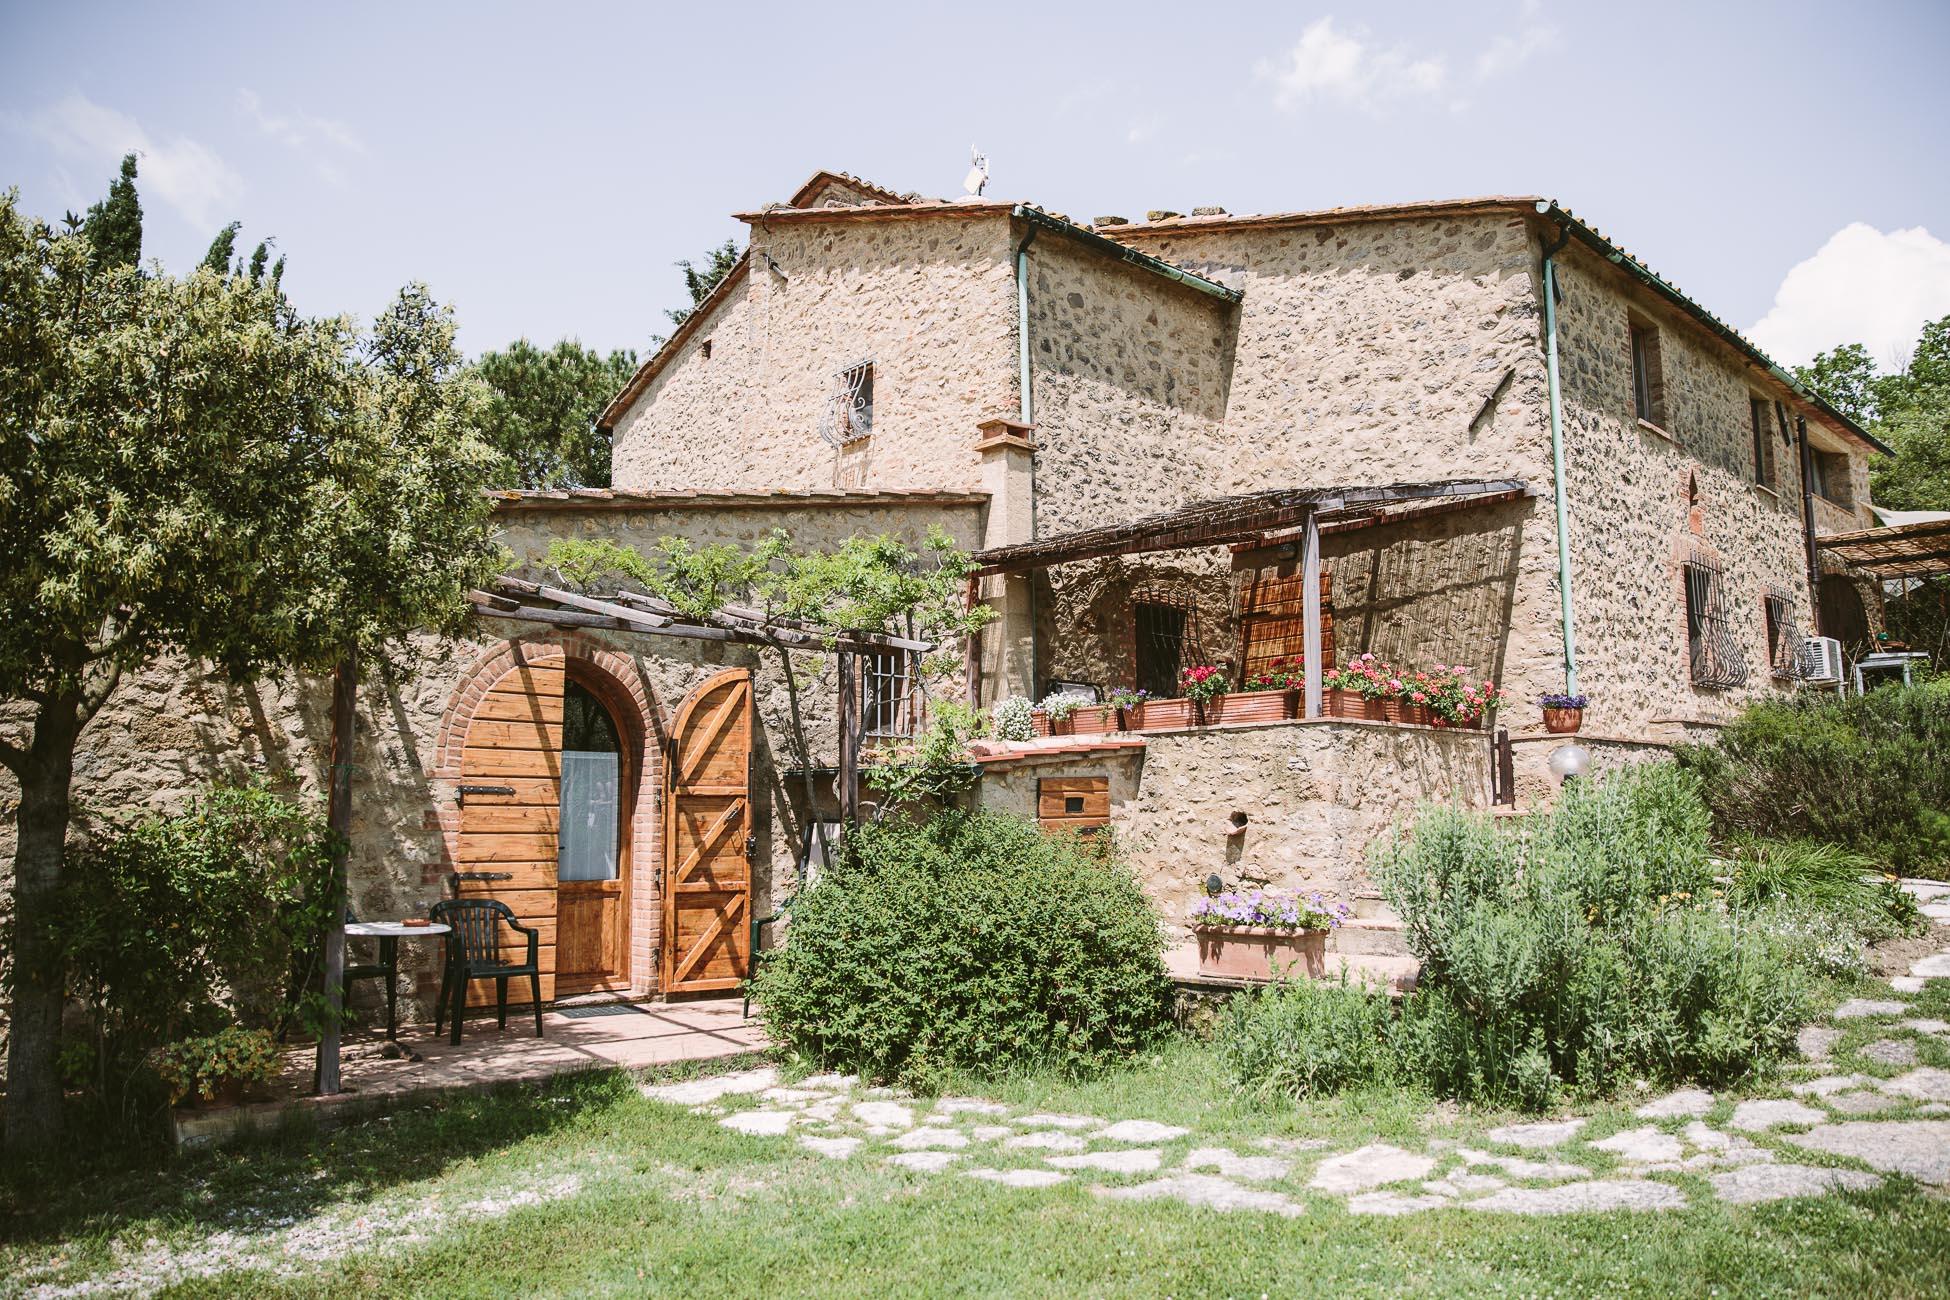 Agriturismo Apparita in Pomarance Tuscany